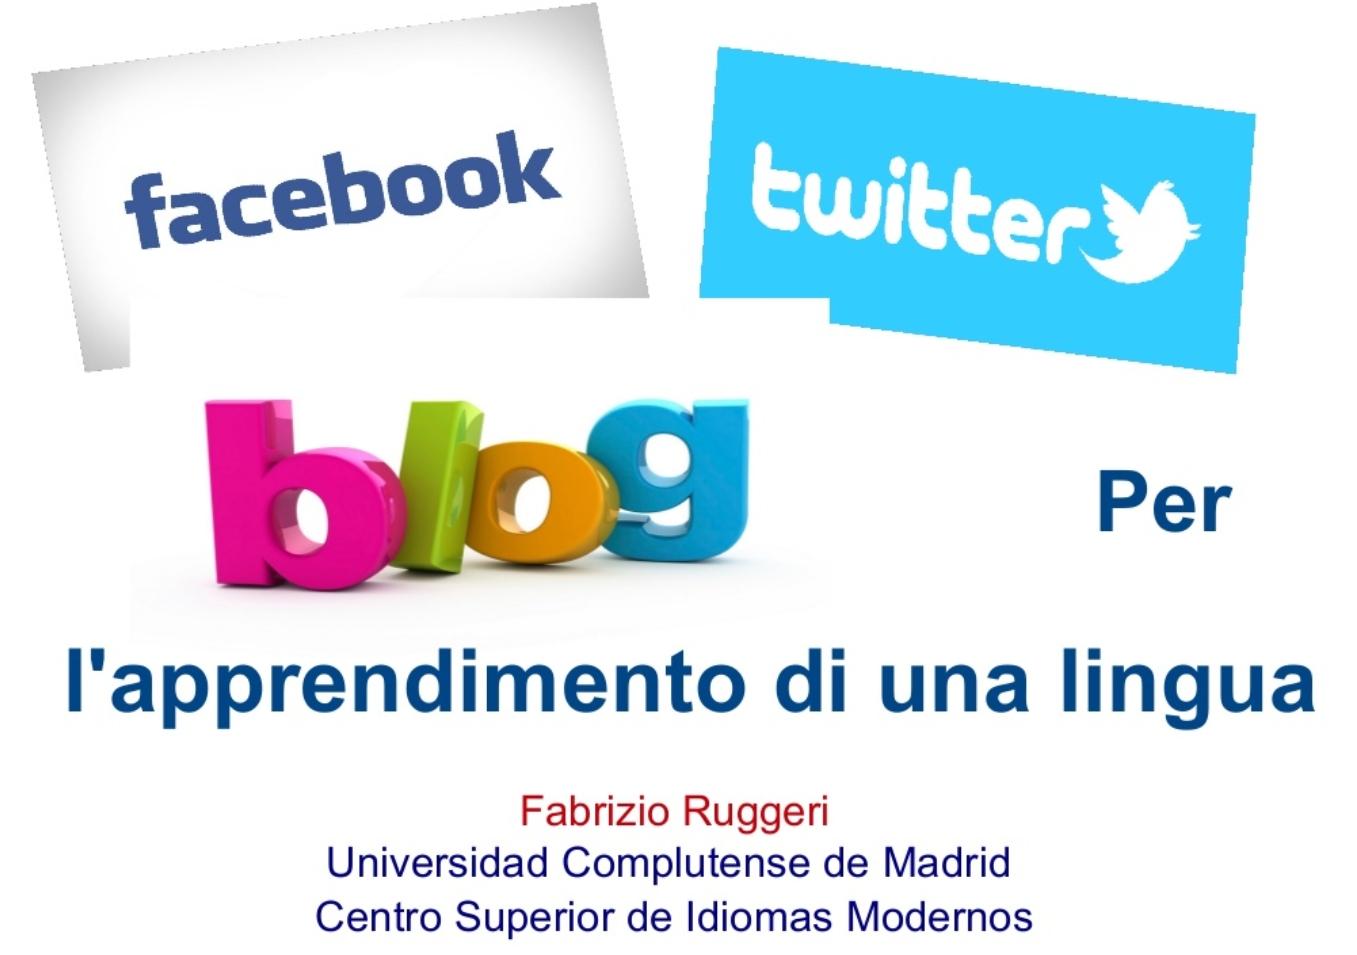 http://www.ildueblog.it/public/2013/09/ruggeri1.jpg